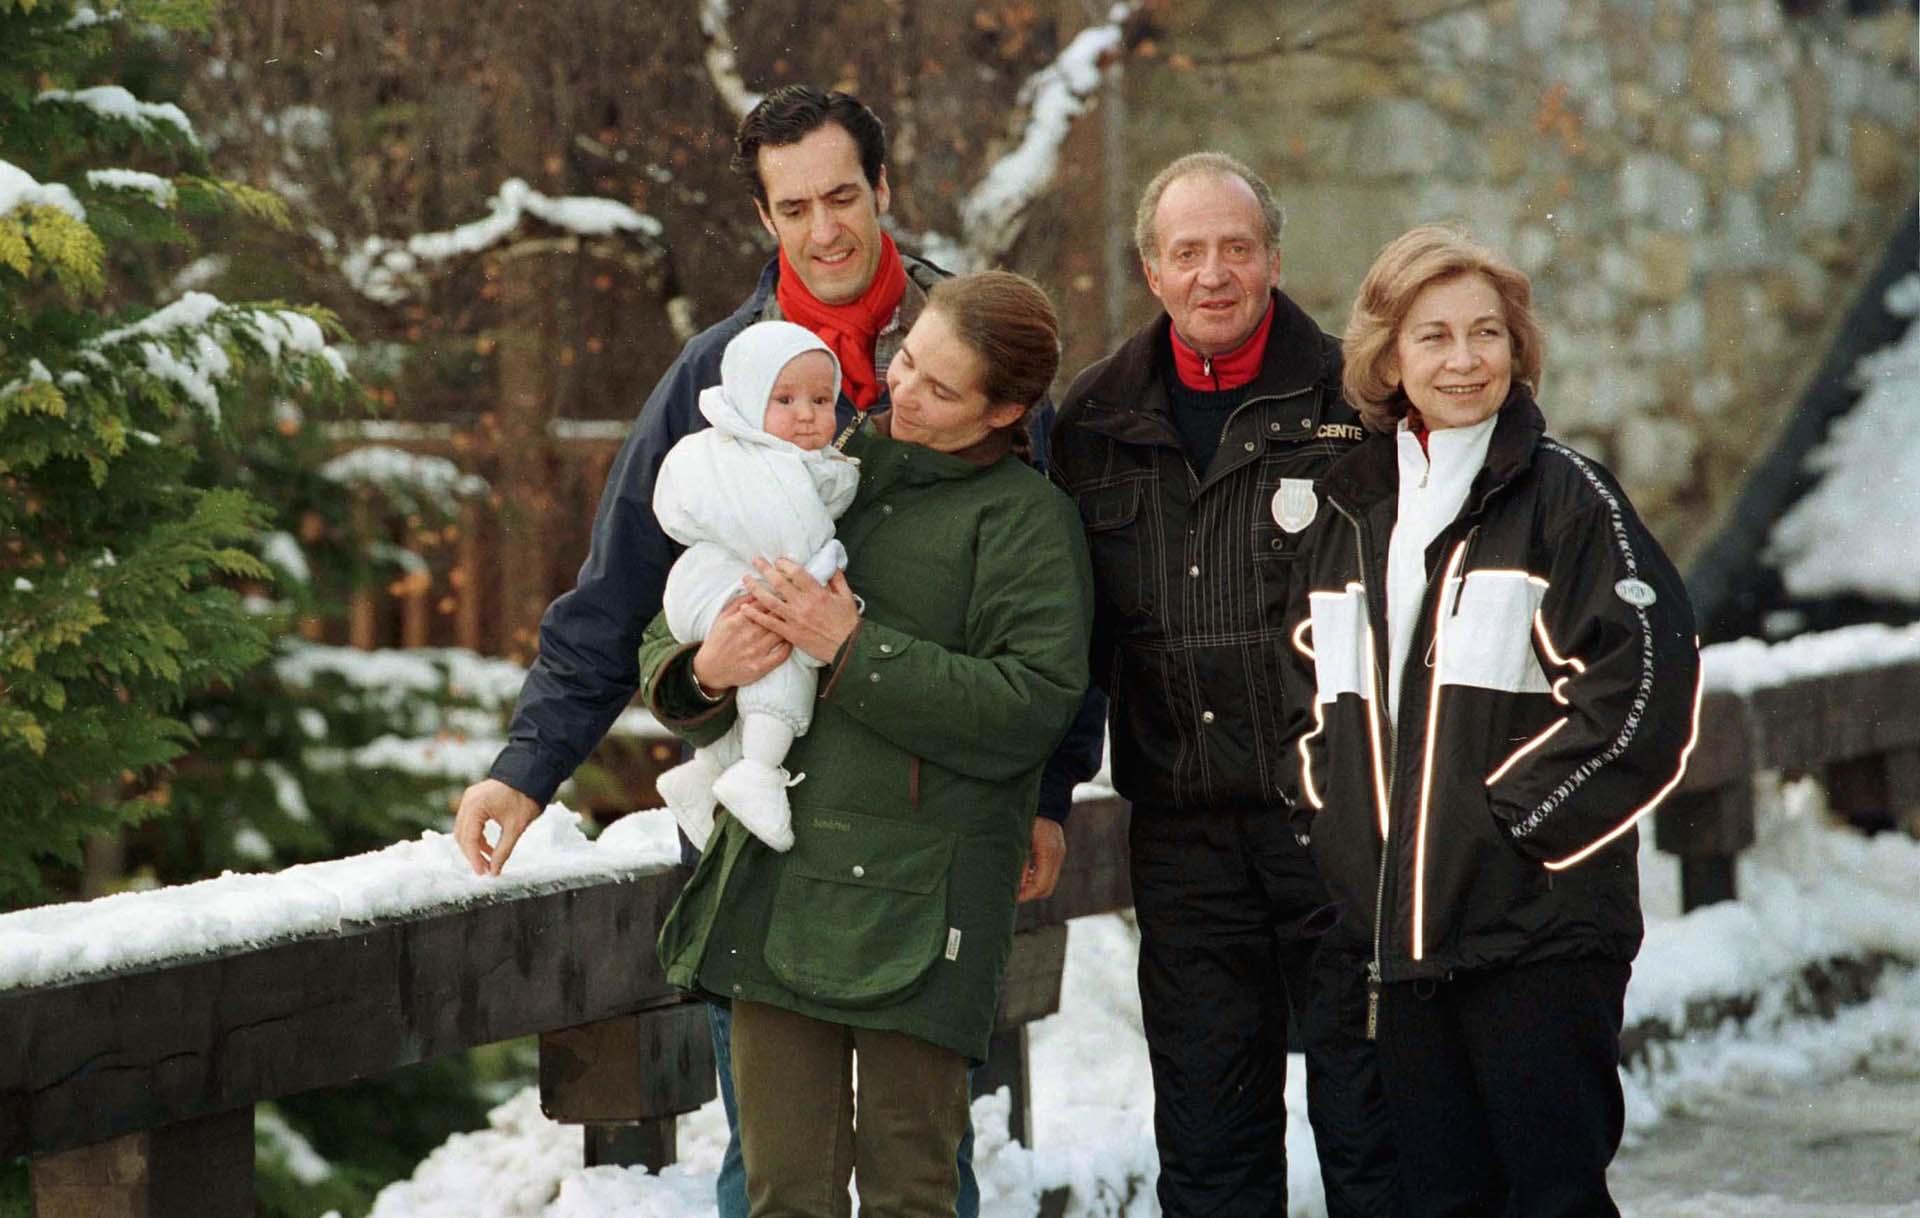 Juan Carlos junto a la reina Sofía, su hija Cristina e Iñaki Urdangarín un centro de ski en España en 1999 (Shutterstock)